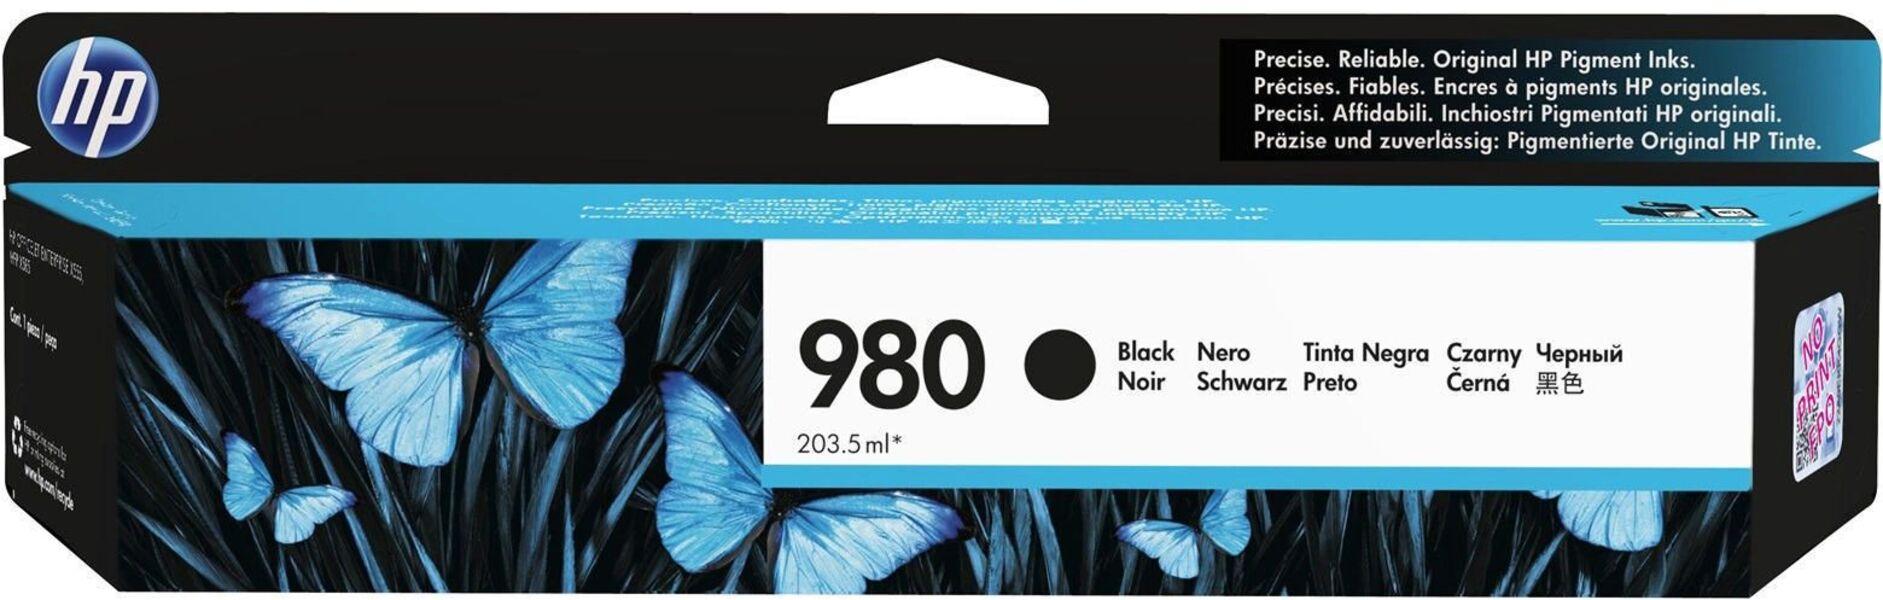 HP Ink/980 Black Original Cartridge D8J10A